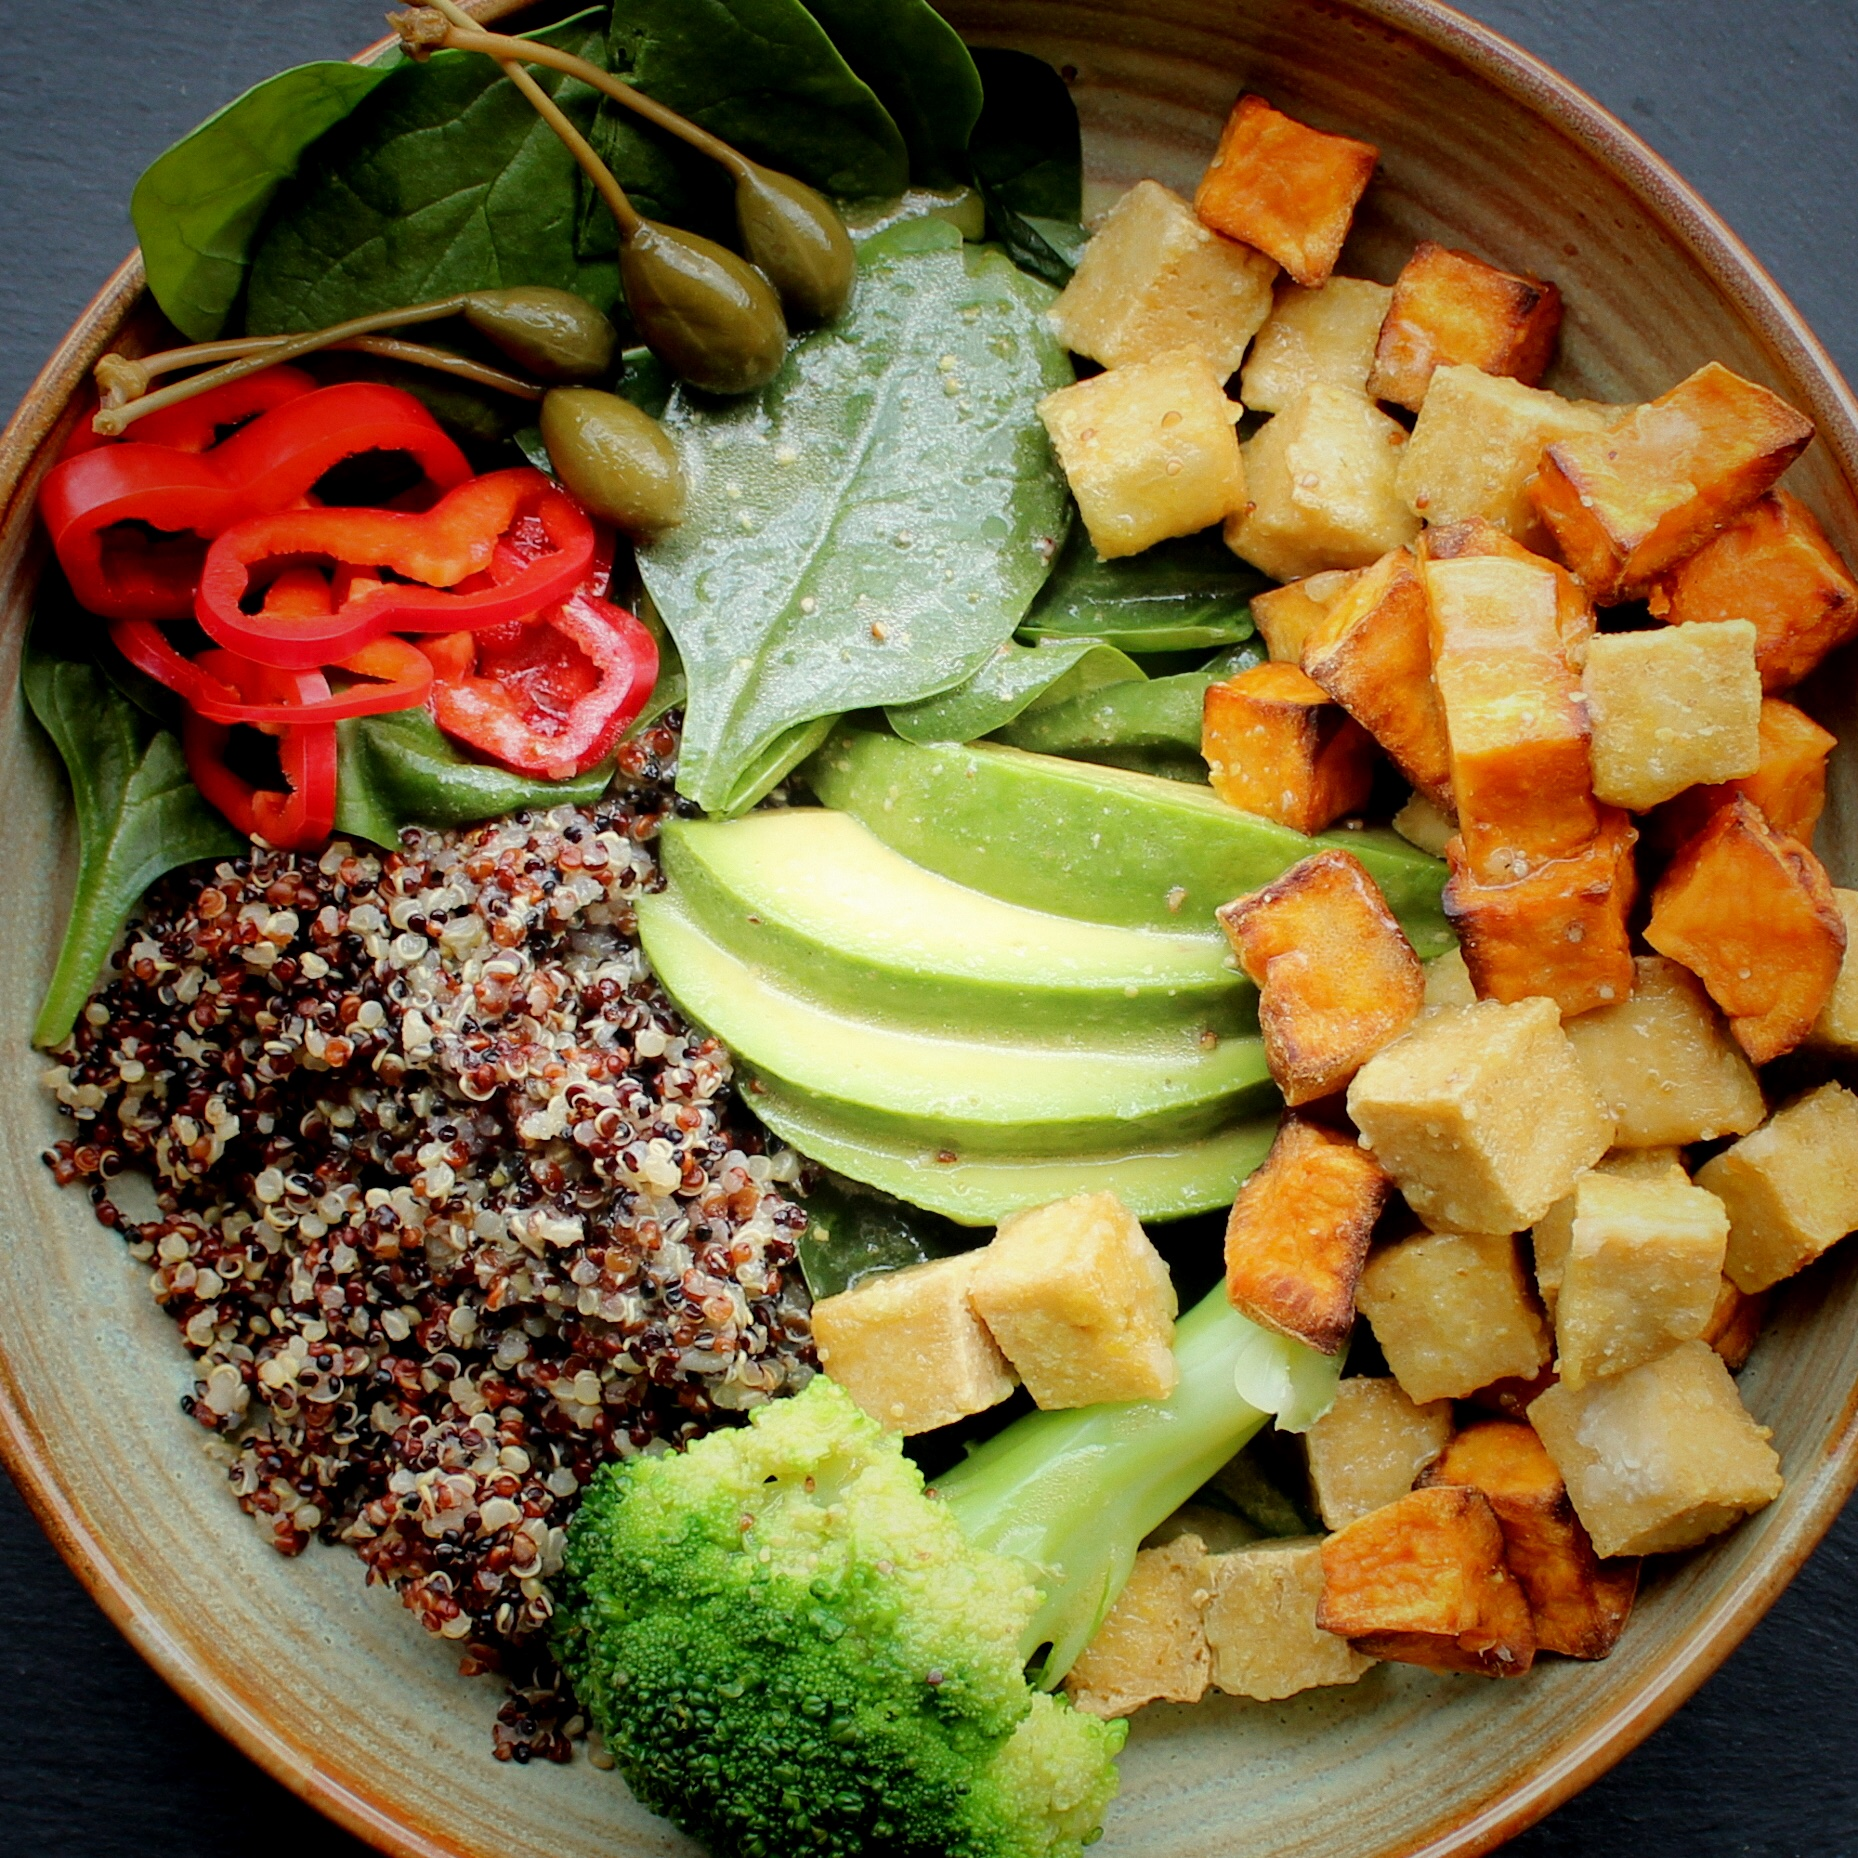 Quinoa Salad with Crispy Tofu Cubes and Lime Vinaigrette